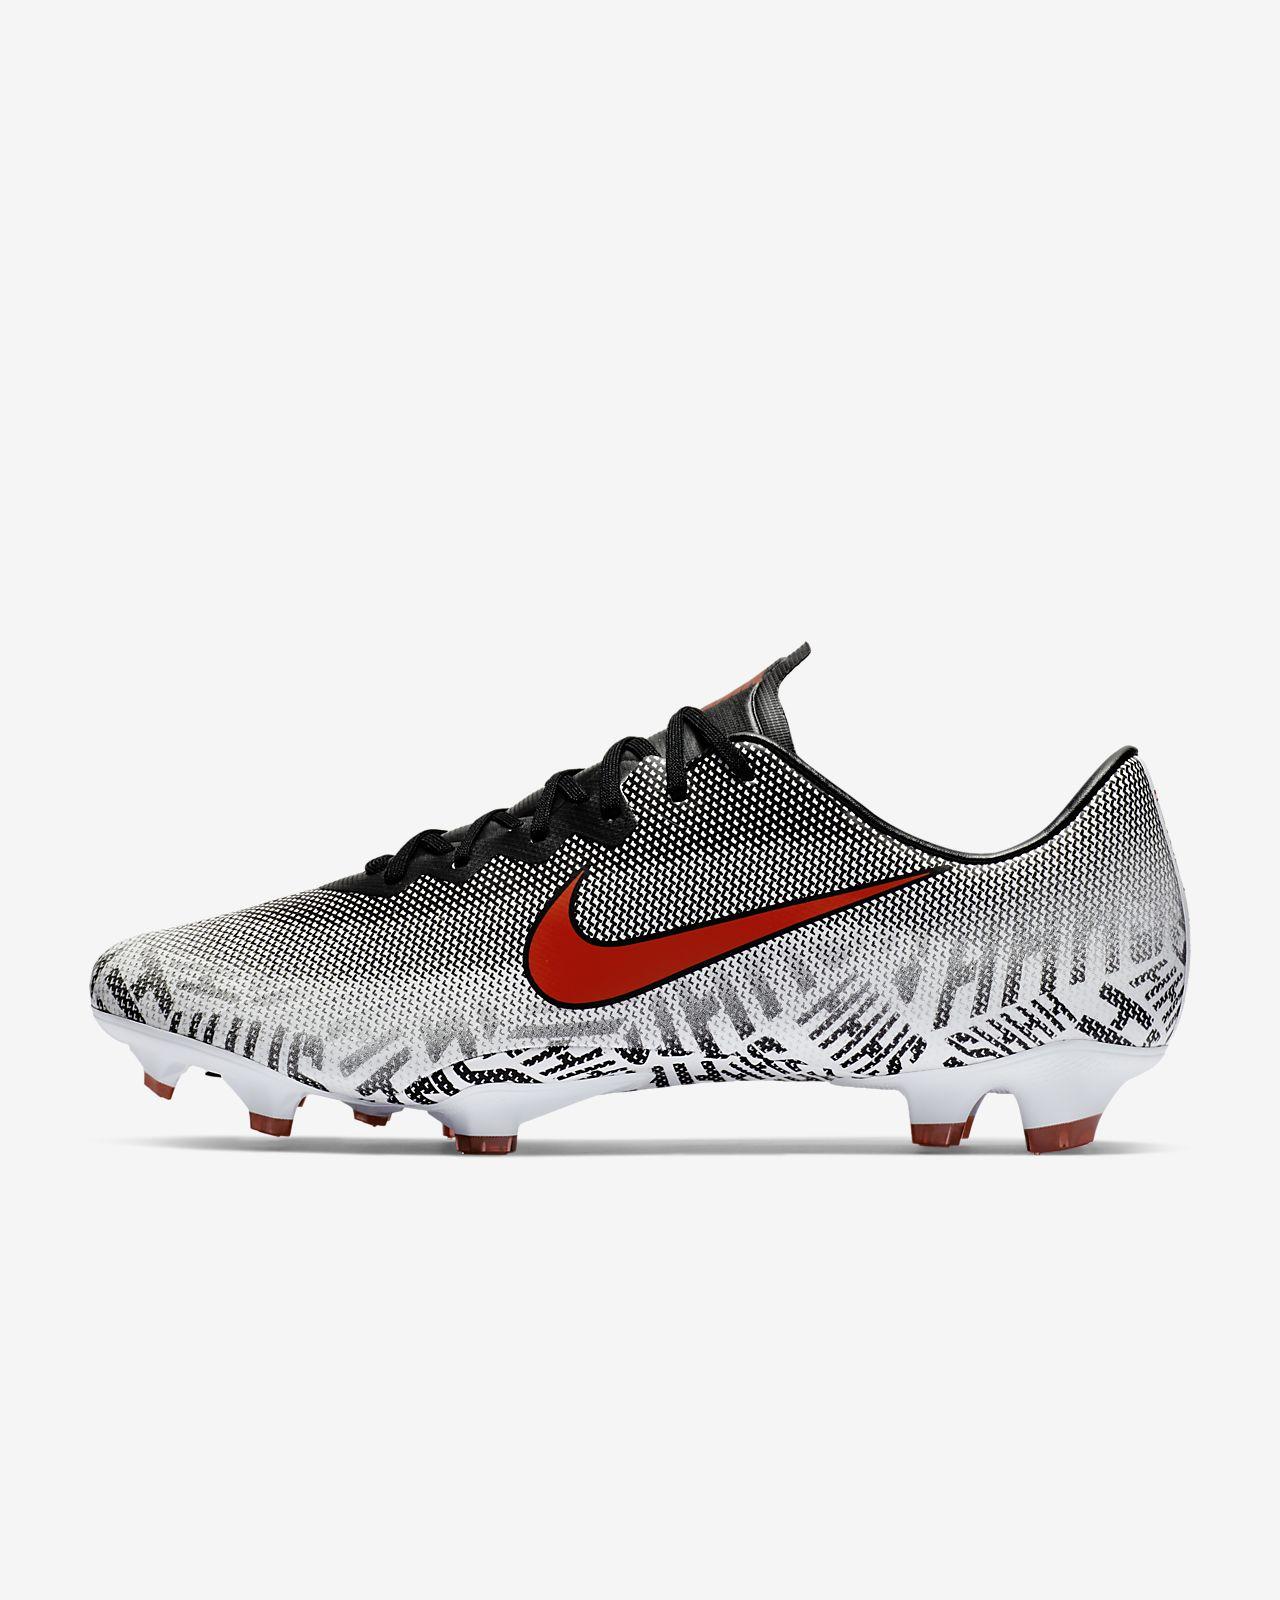 b35640fc026f Men's Firm-Ground Football Boot. Nike Mercurial Vapor XII Pro Neymar Jr.